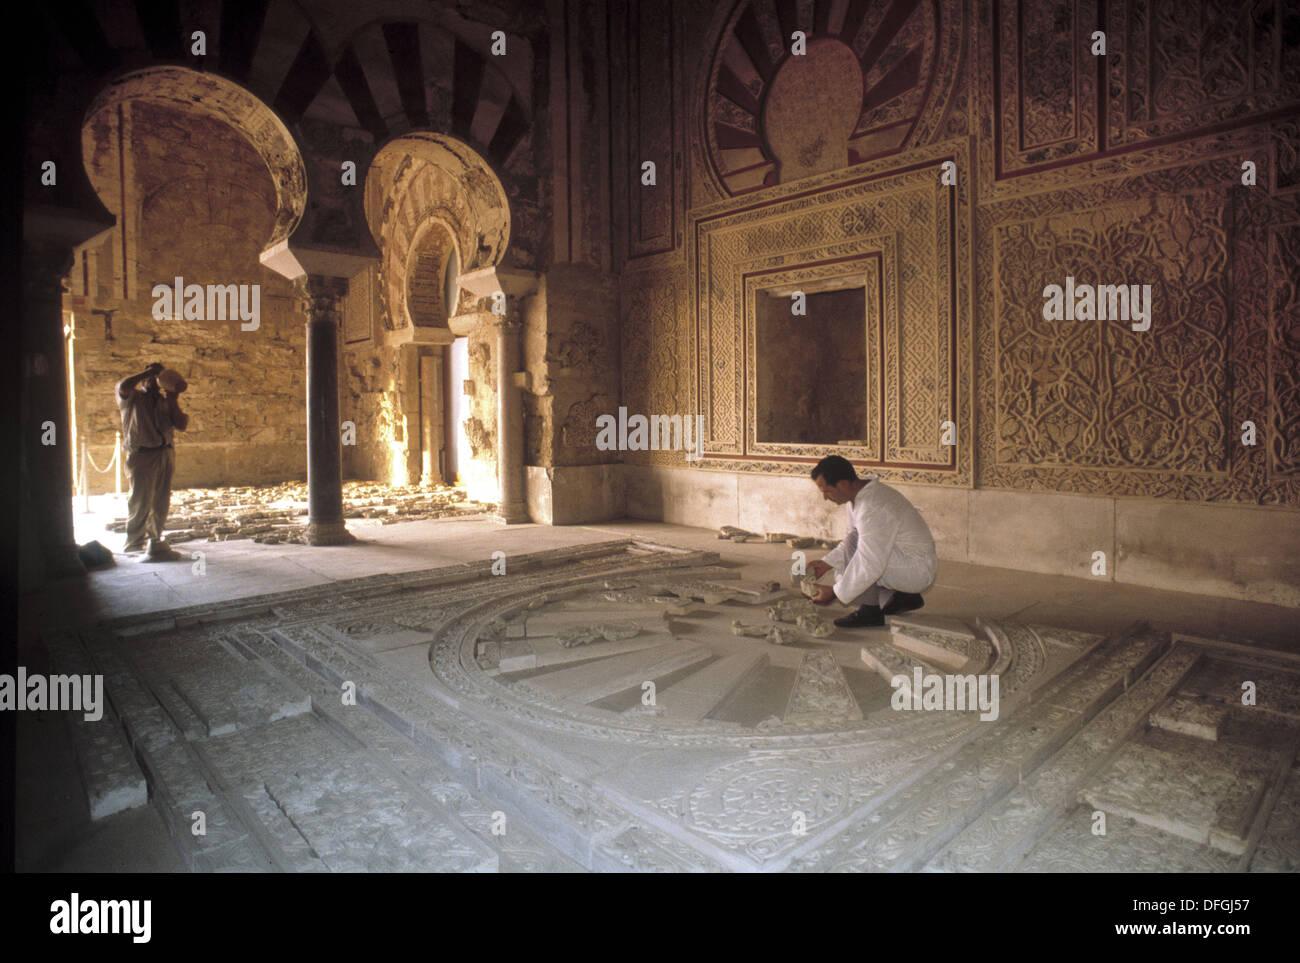 Restauration of Abd-al Rahman III Hall at the moorish ruins of Medina Azahara. Cordoba. Spain. - Stock Image